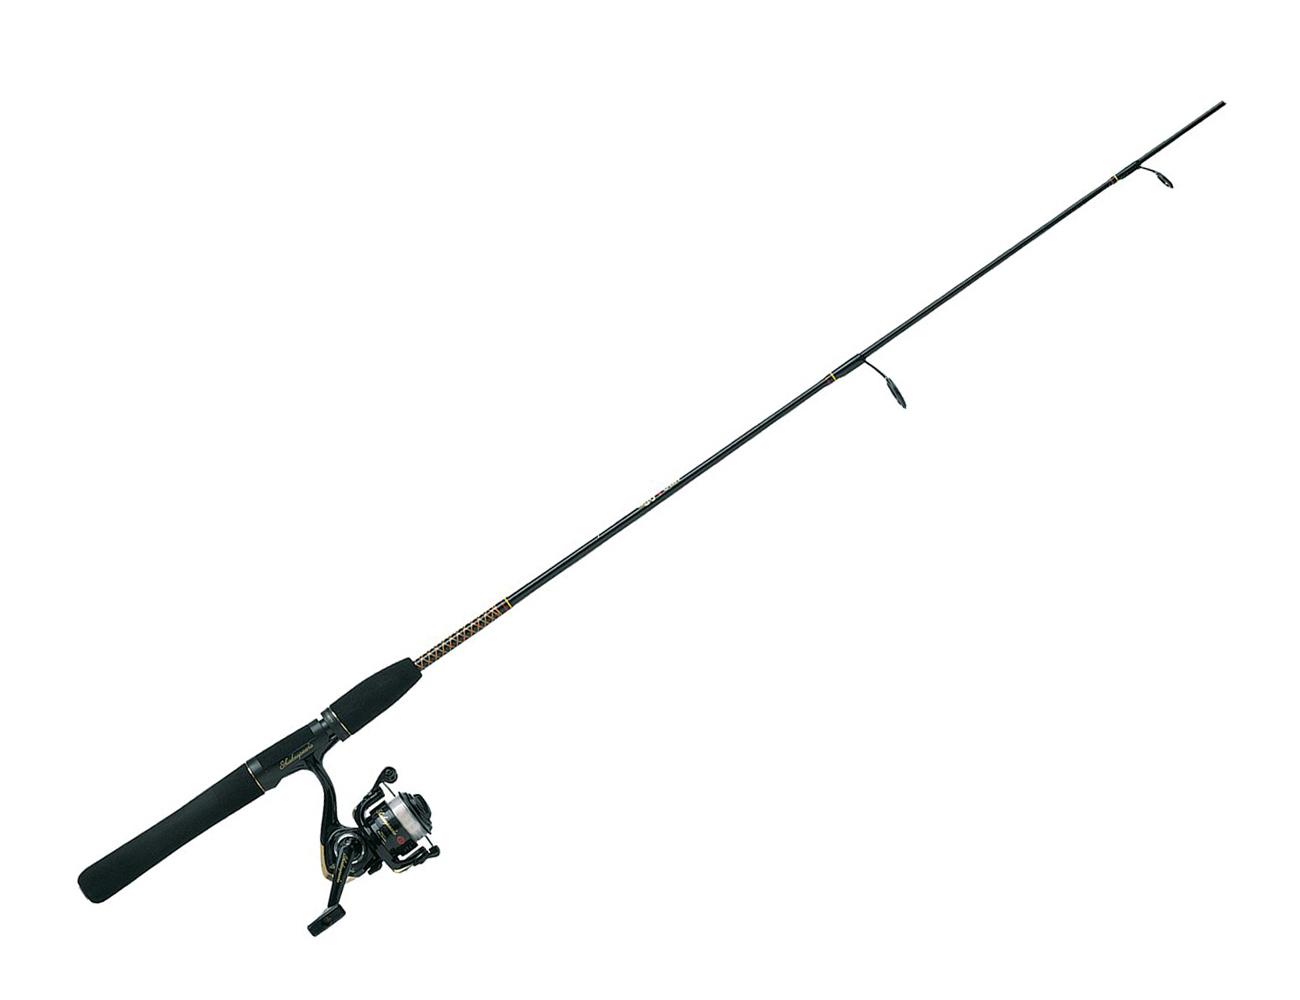 Fishing pole fishing rod clipart kiaavto 2 image.